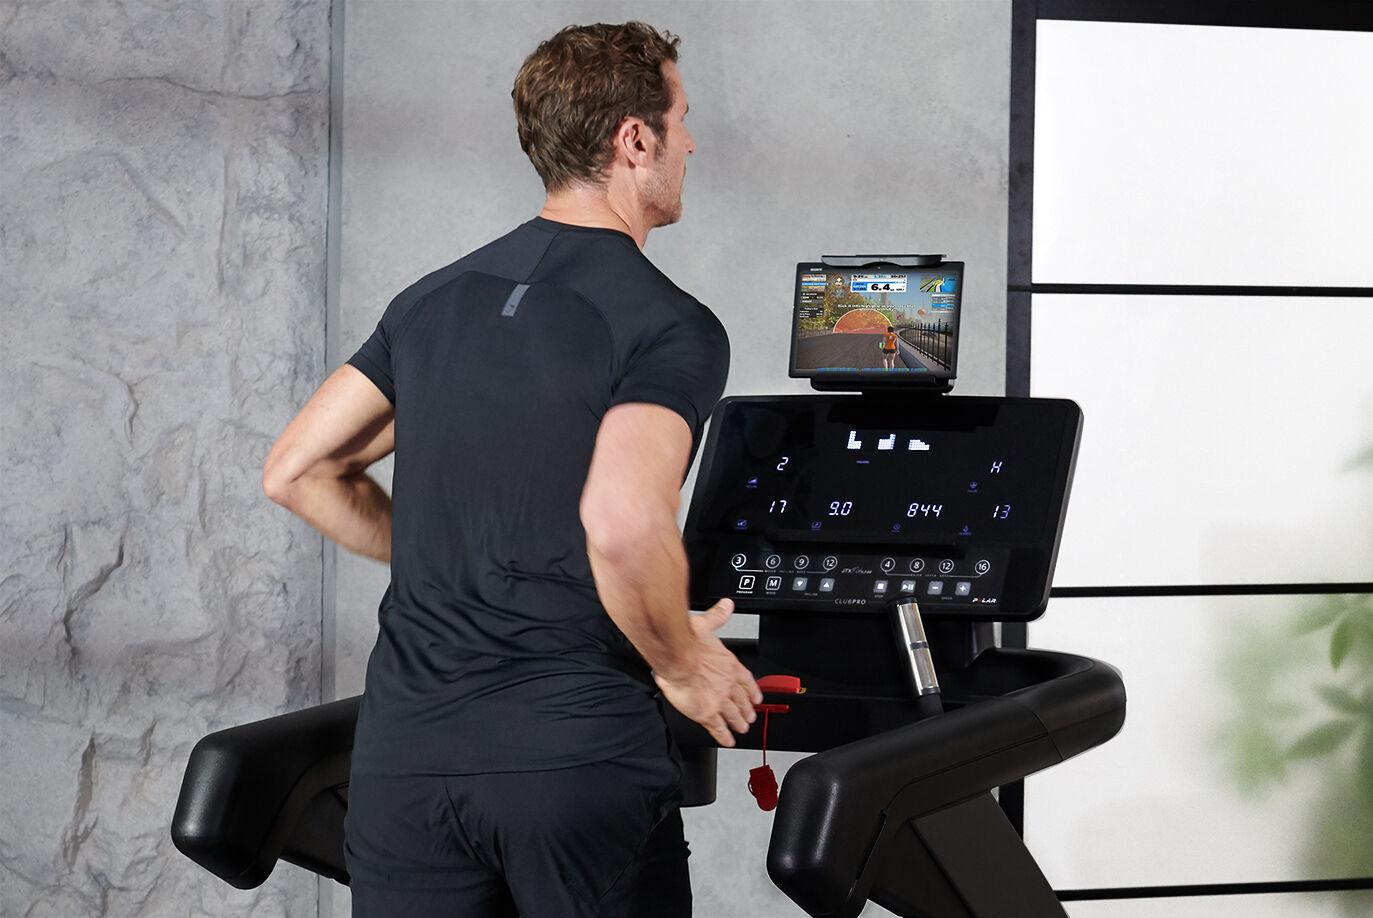 Professional Treadmill Advanced Computer